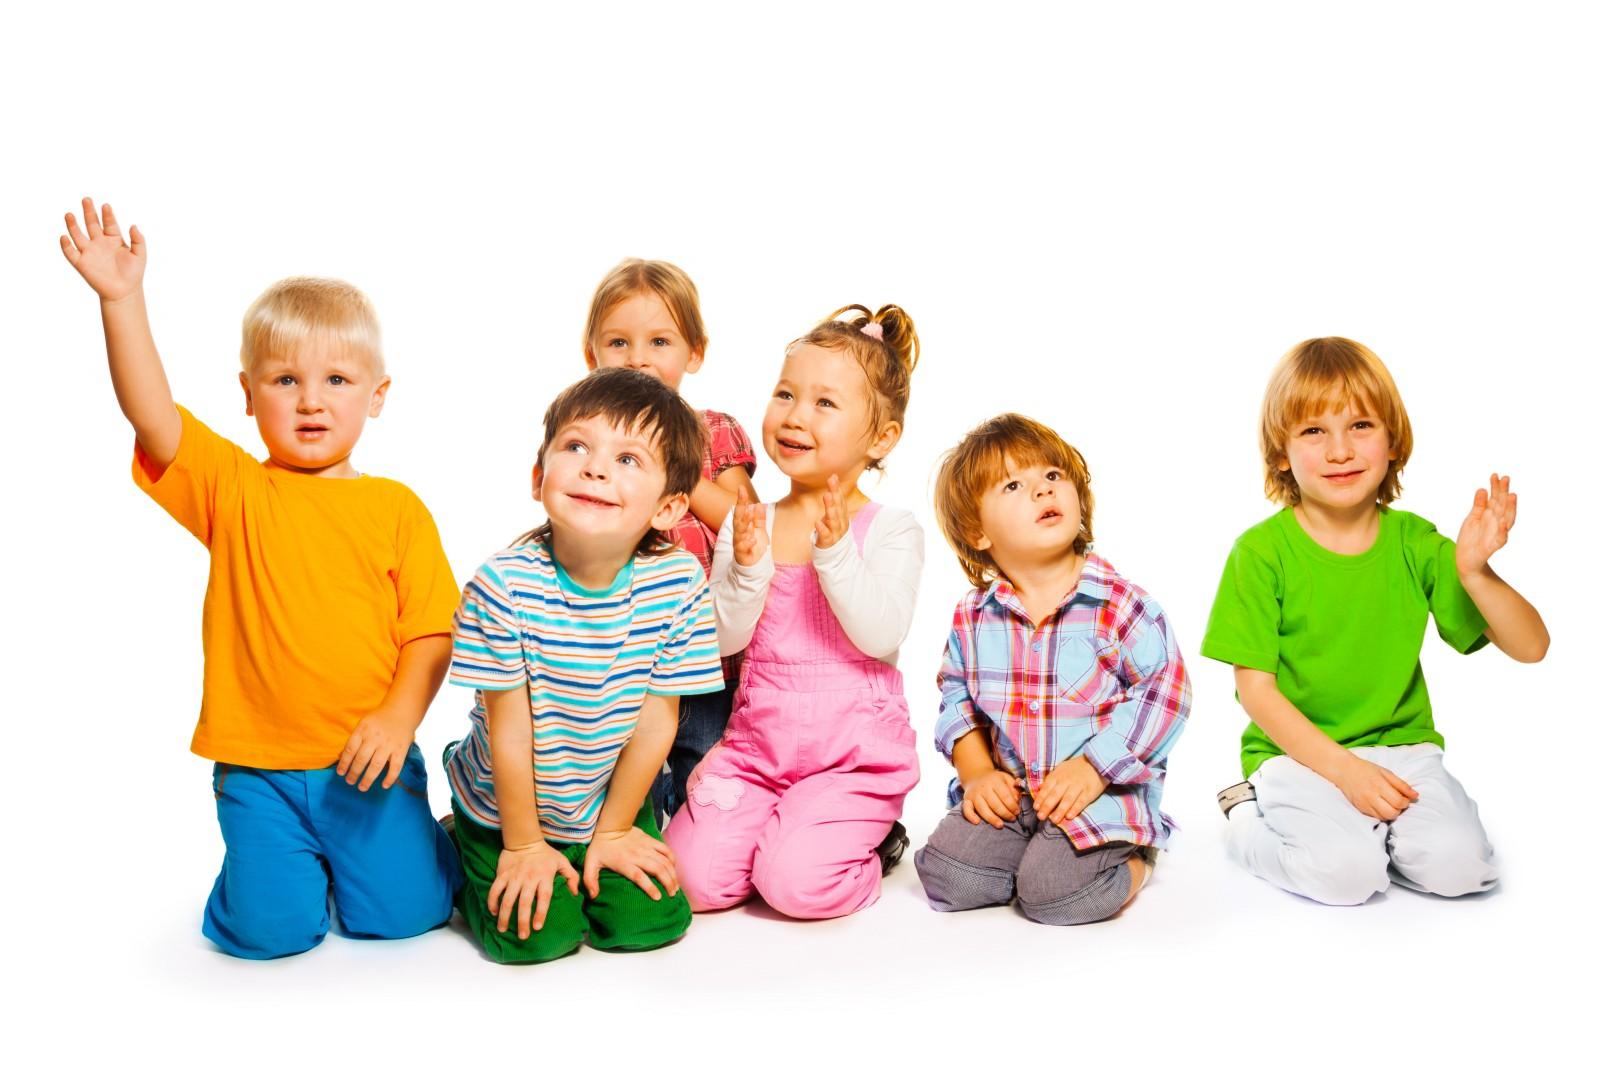 group of little kids